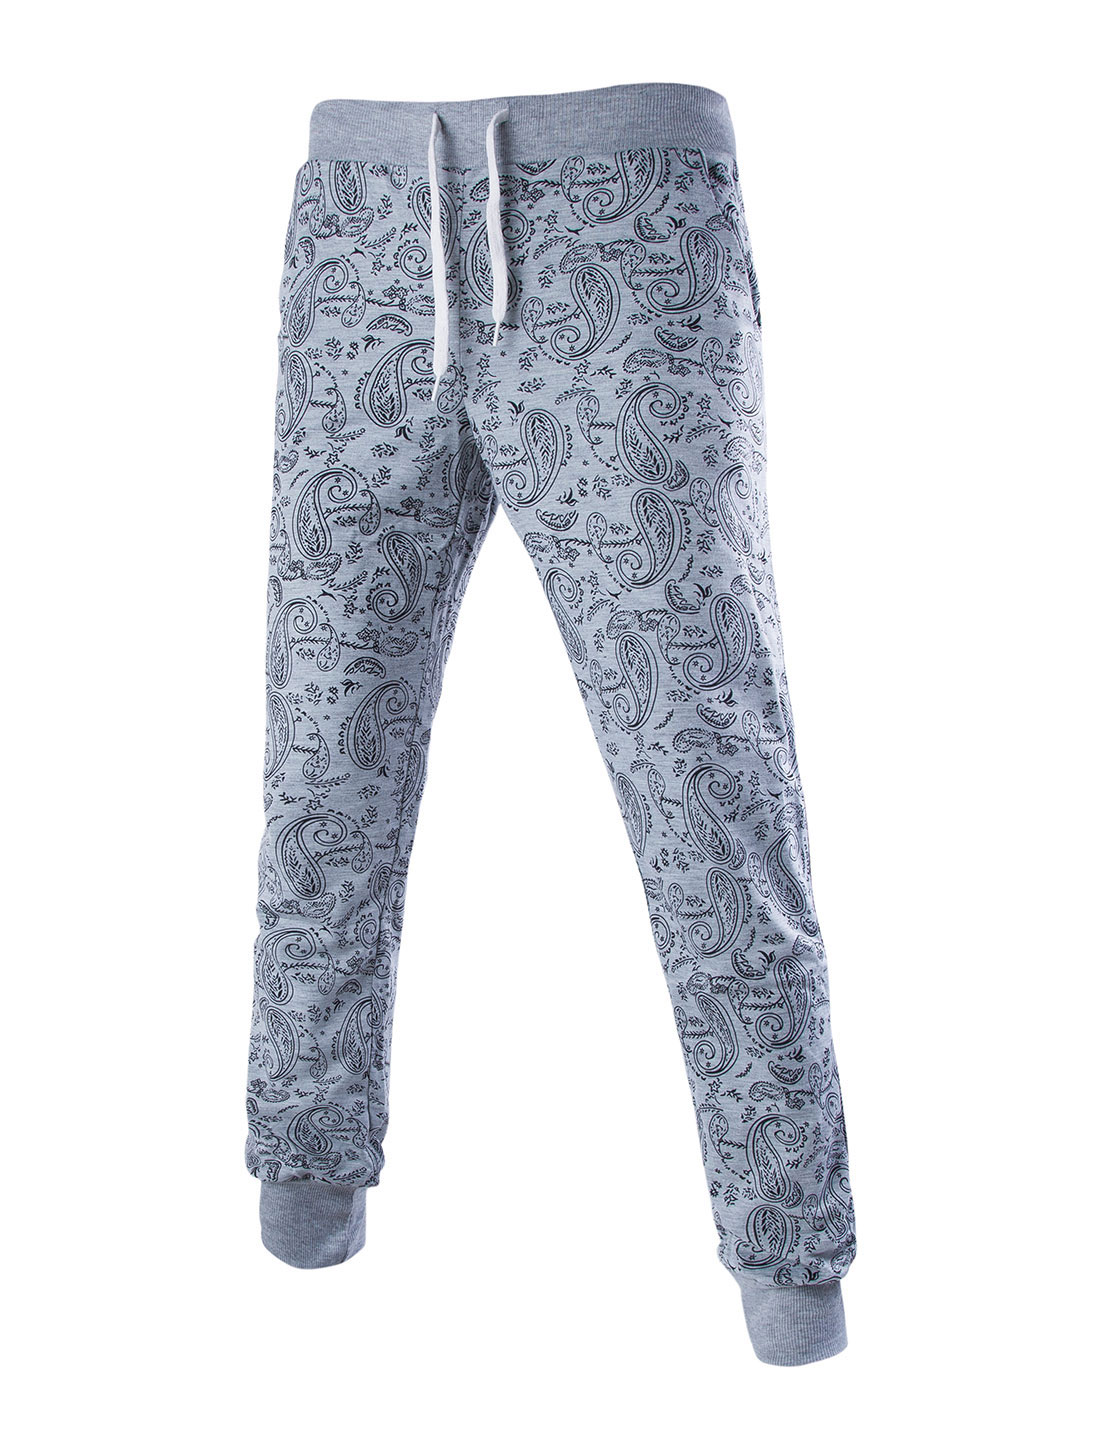 Men Pockets Paisleys Drawstring Waist Casual Trousers Light Gray W32